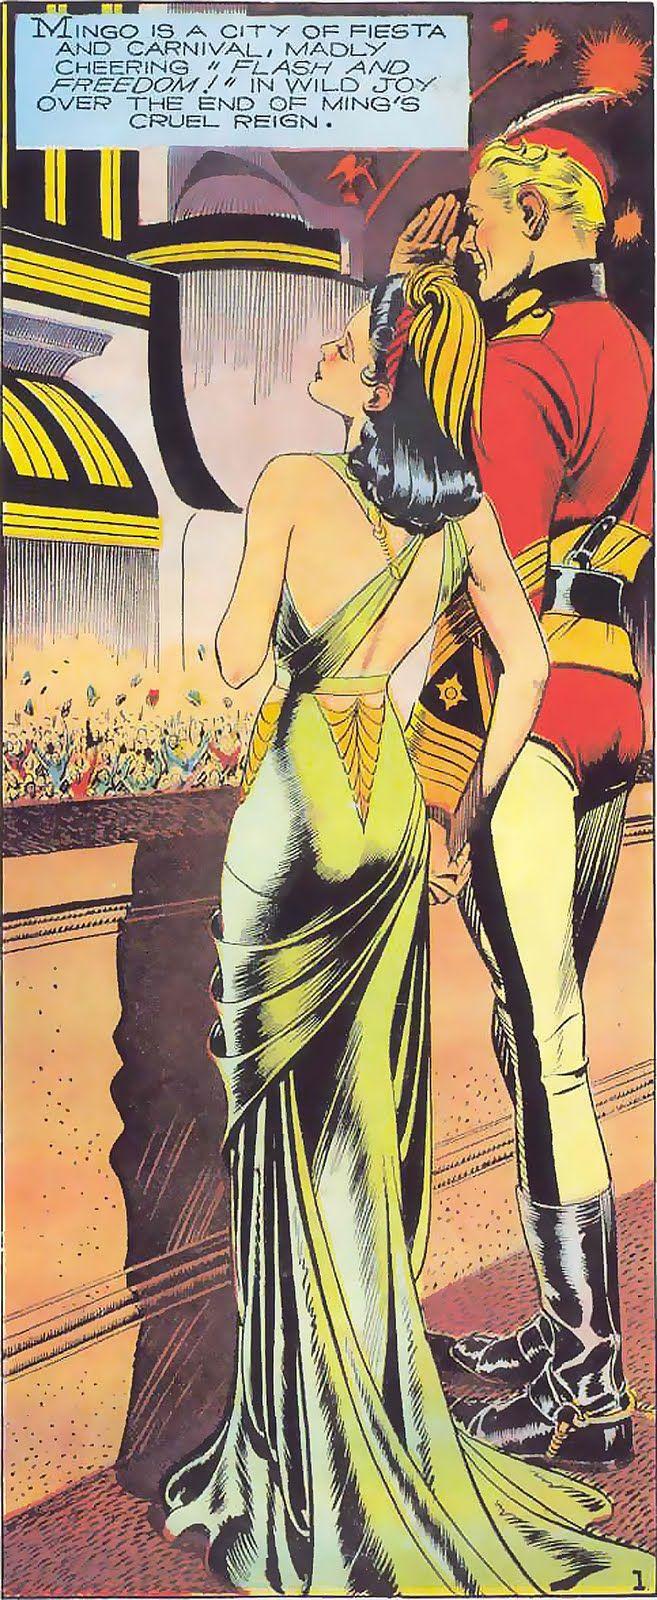 1941 Flash Gordon by Alex Raymond